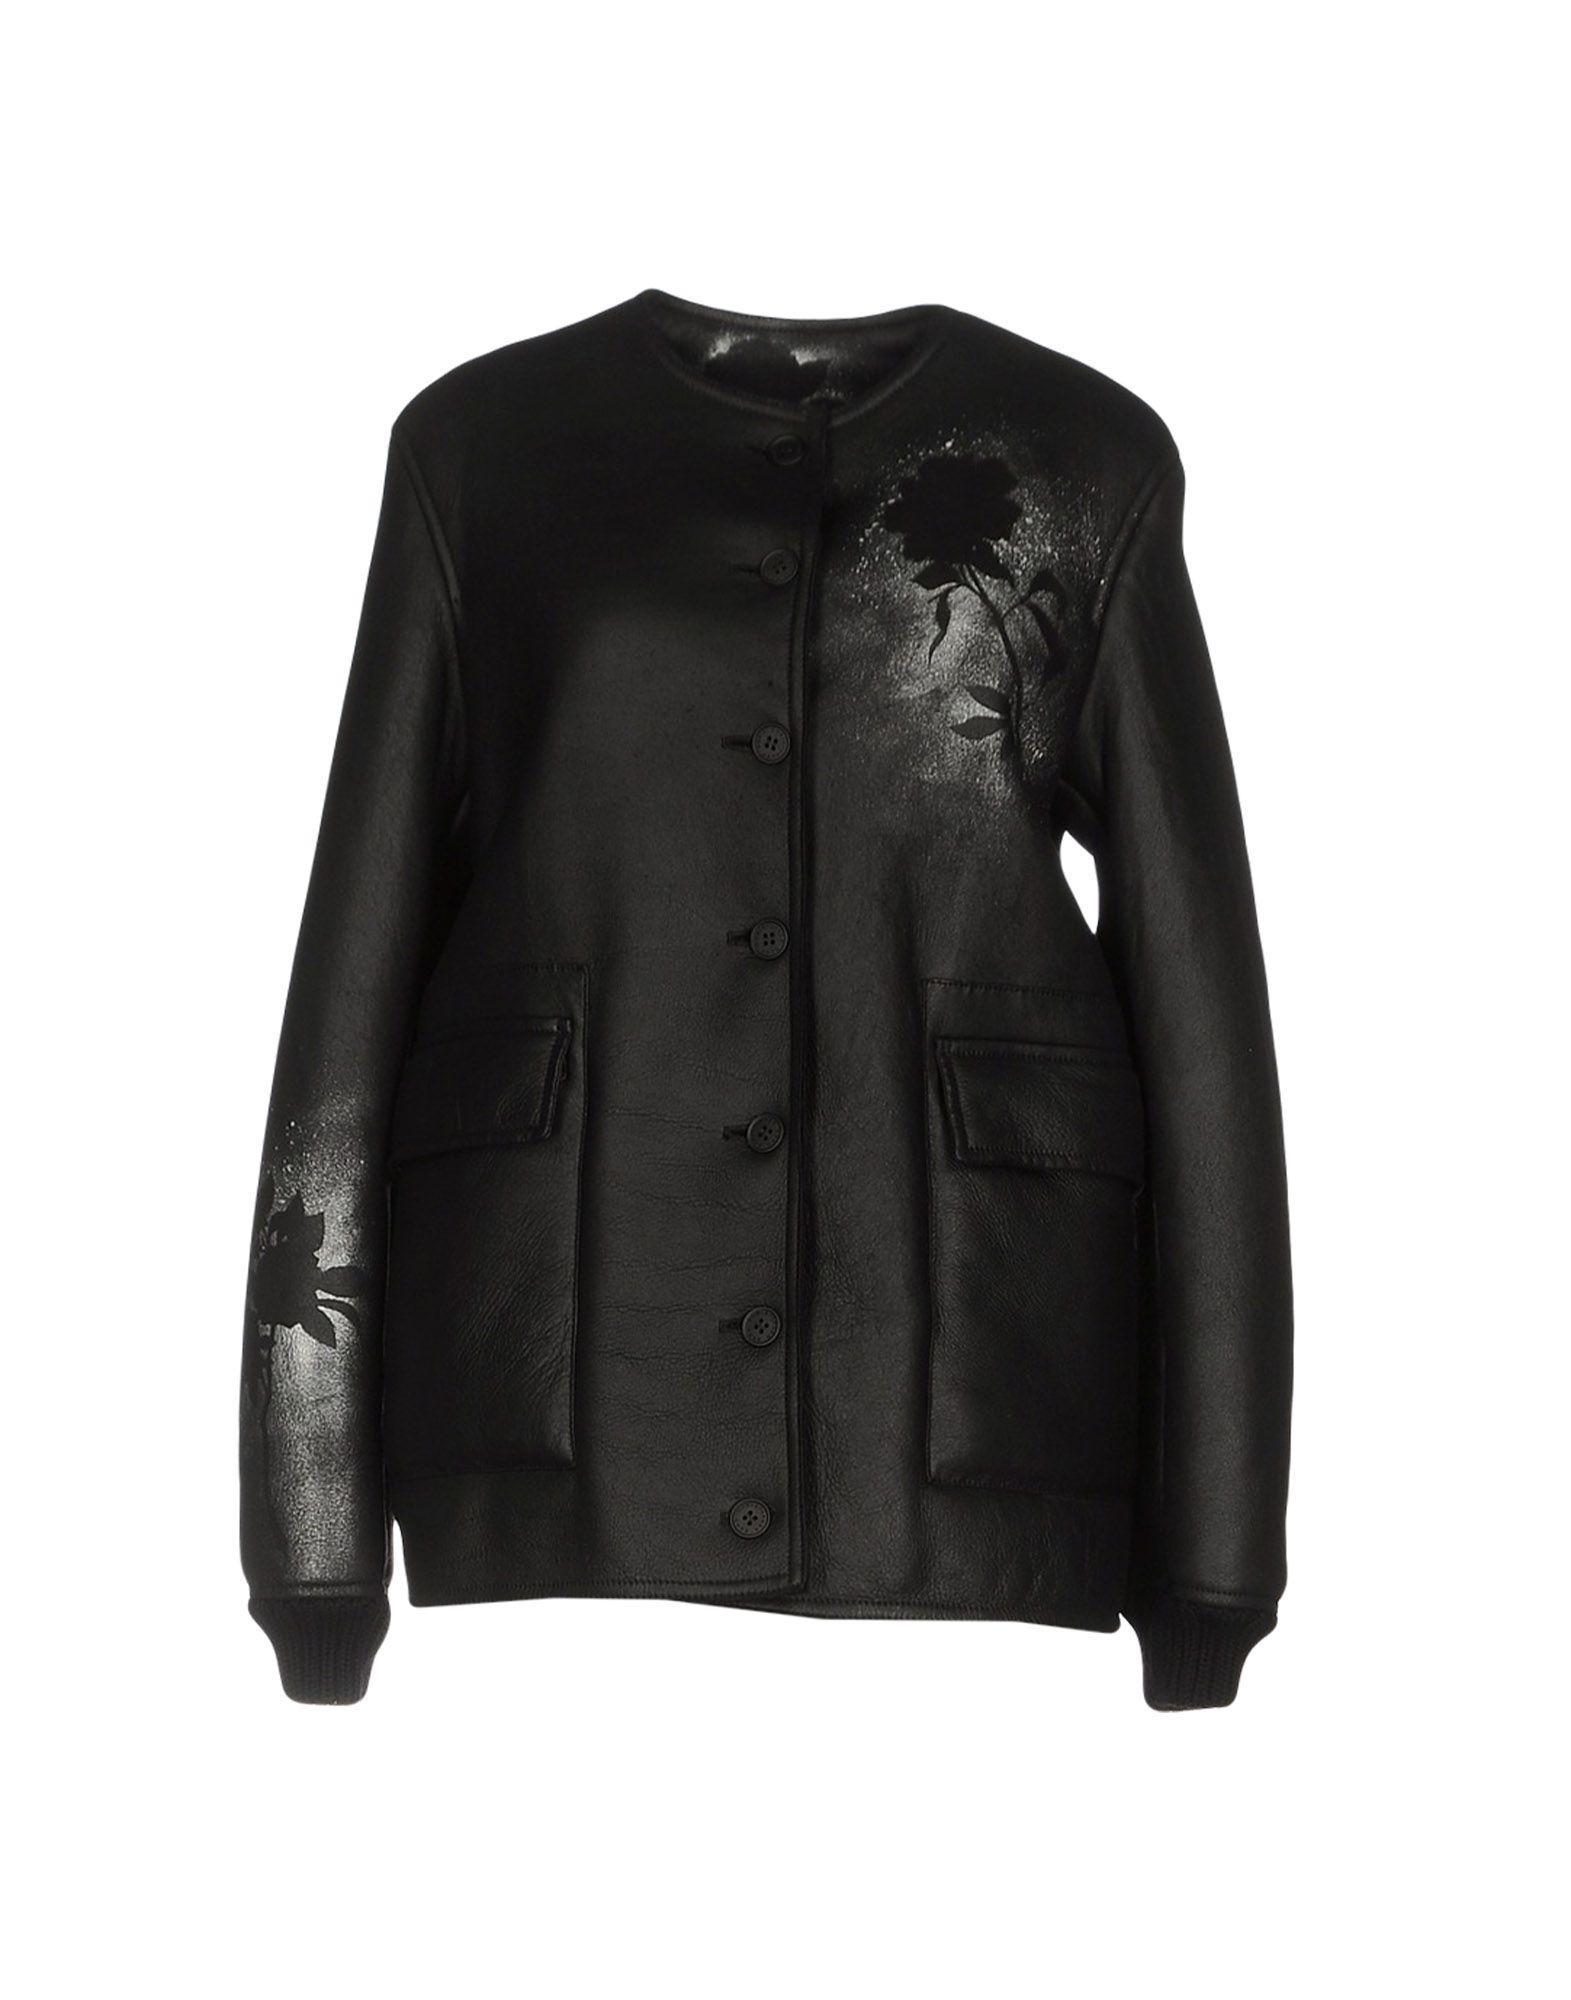 Christopher Kane Leather Jacket In Black